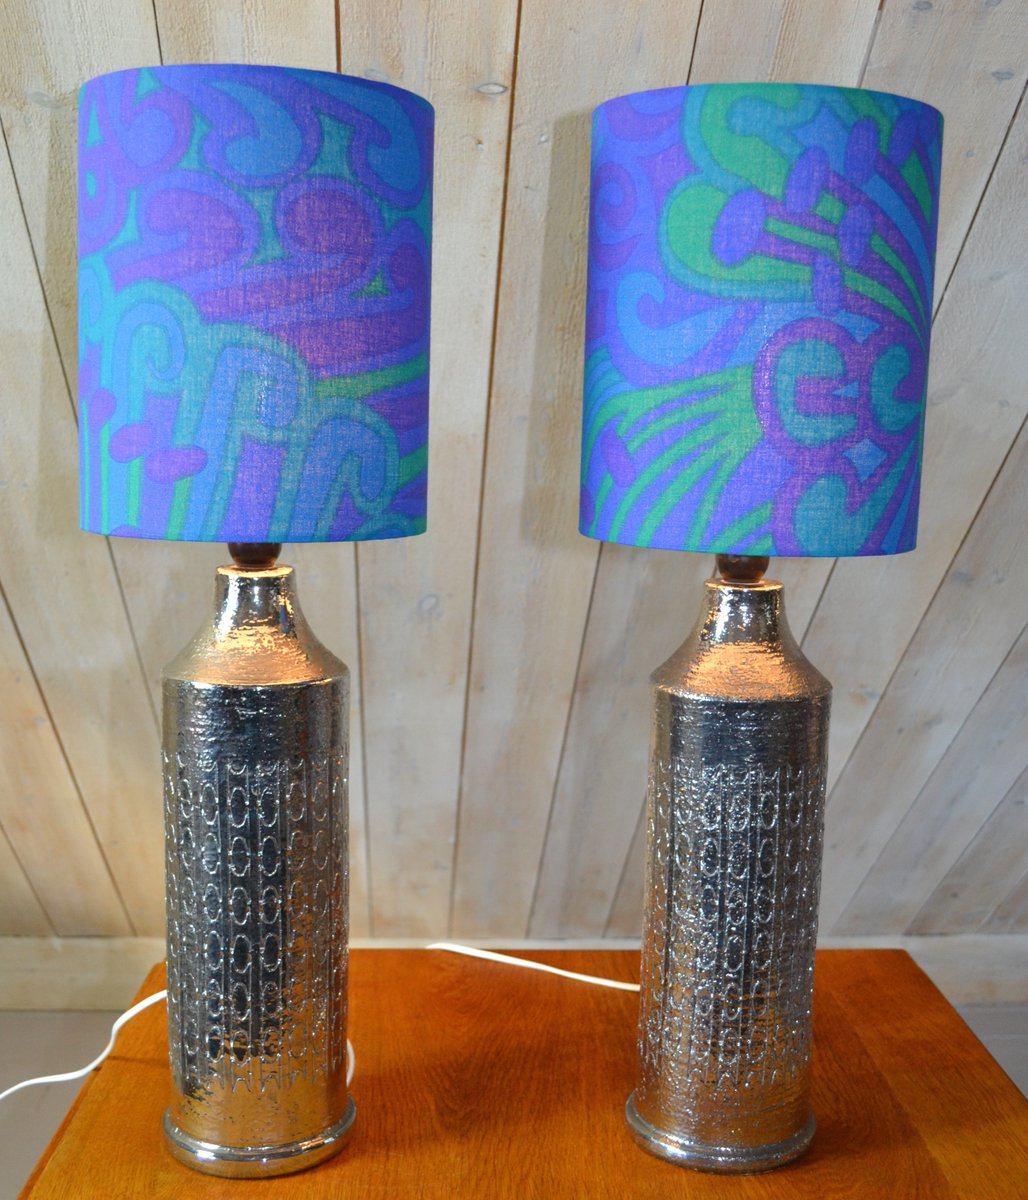 https://cdn20.pamono.com/p/z/1/5/150082_qsu2ul3zbq/lampade-da-tavolo-in-ceramica-smaltata-con-paralumi-blu-di-bitossi-per-bergbom-set-di-2-immagine-1.jpg